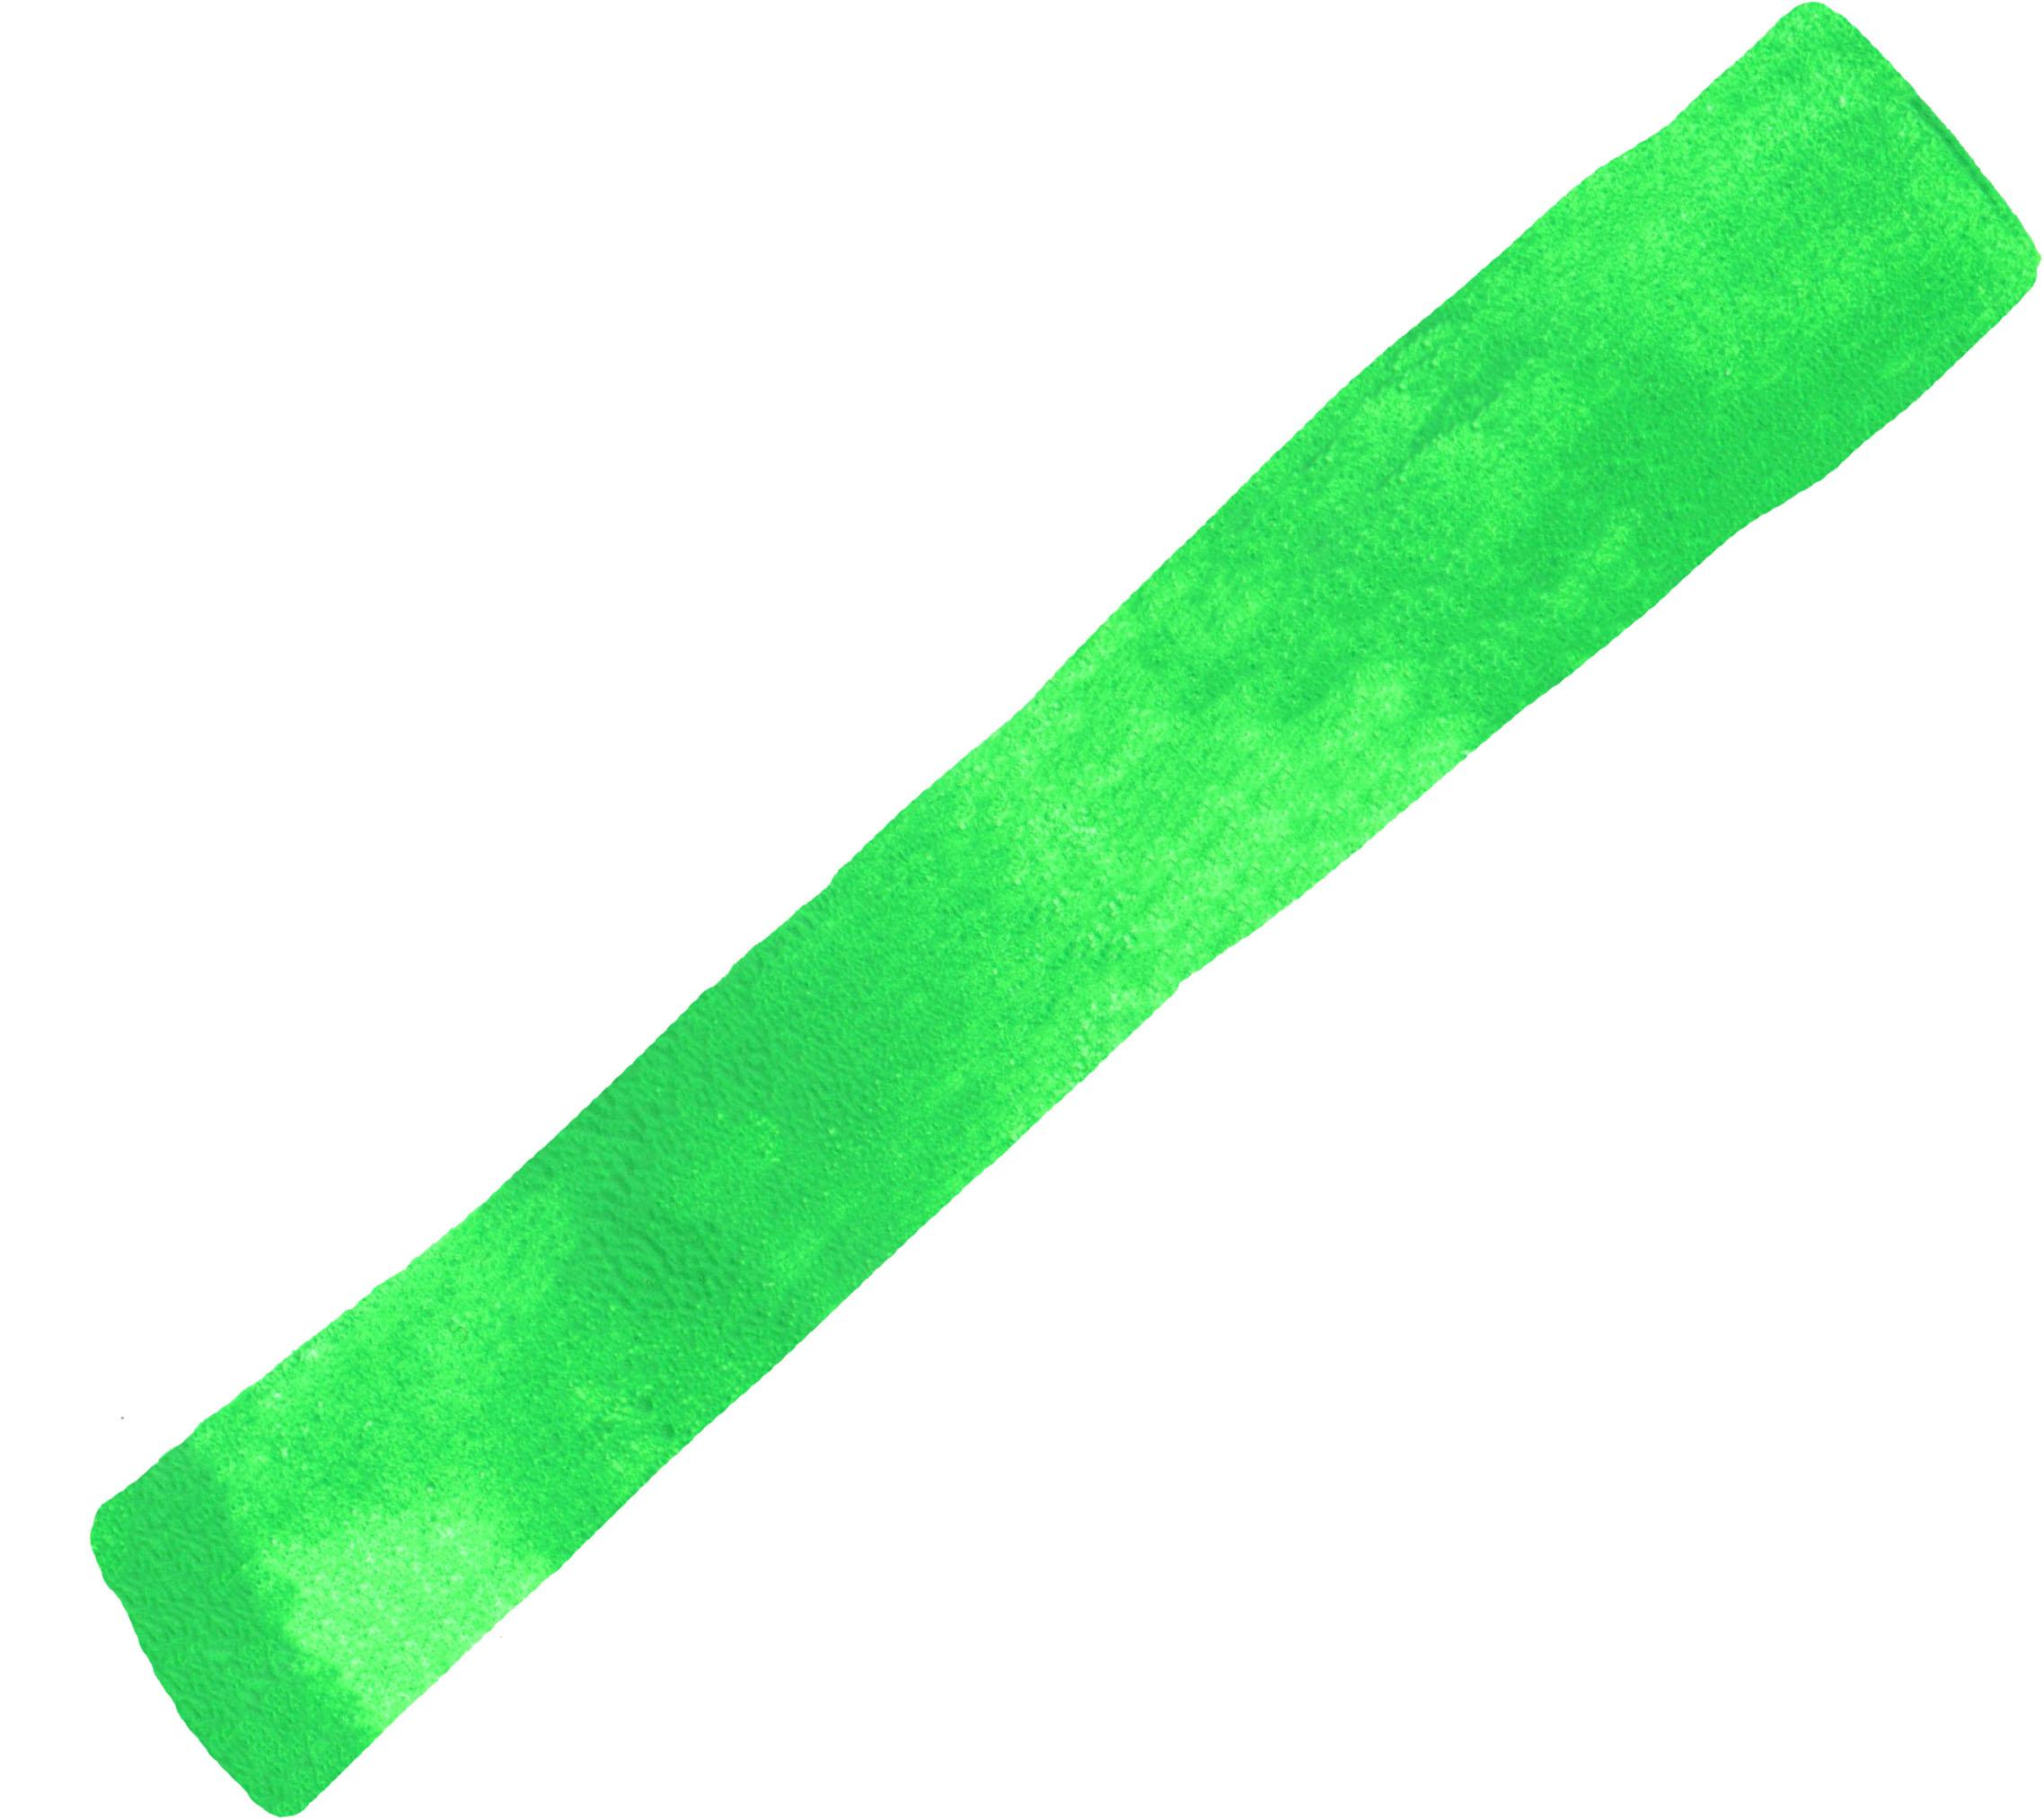 greenstripe.jpg